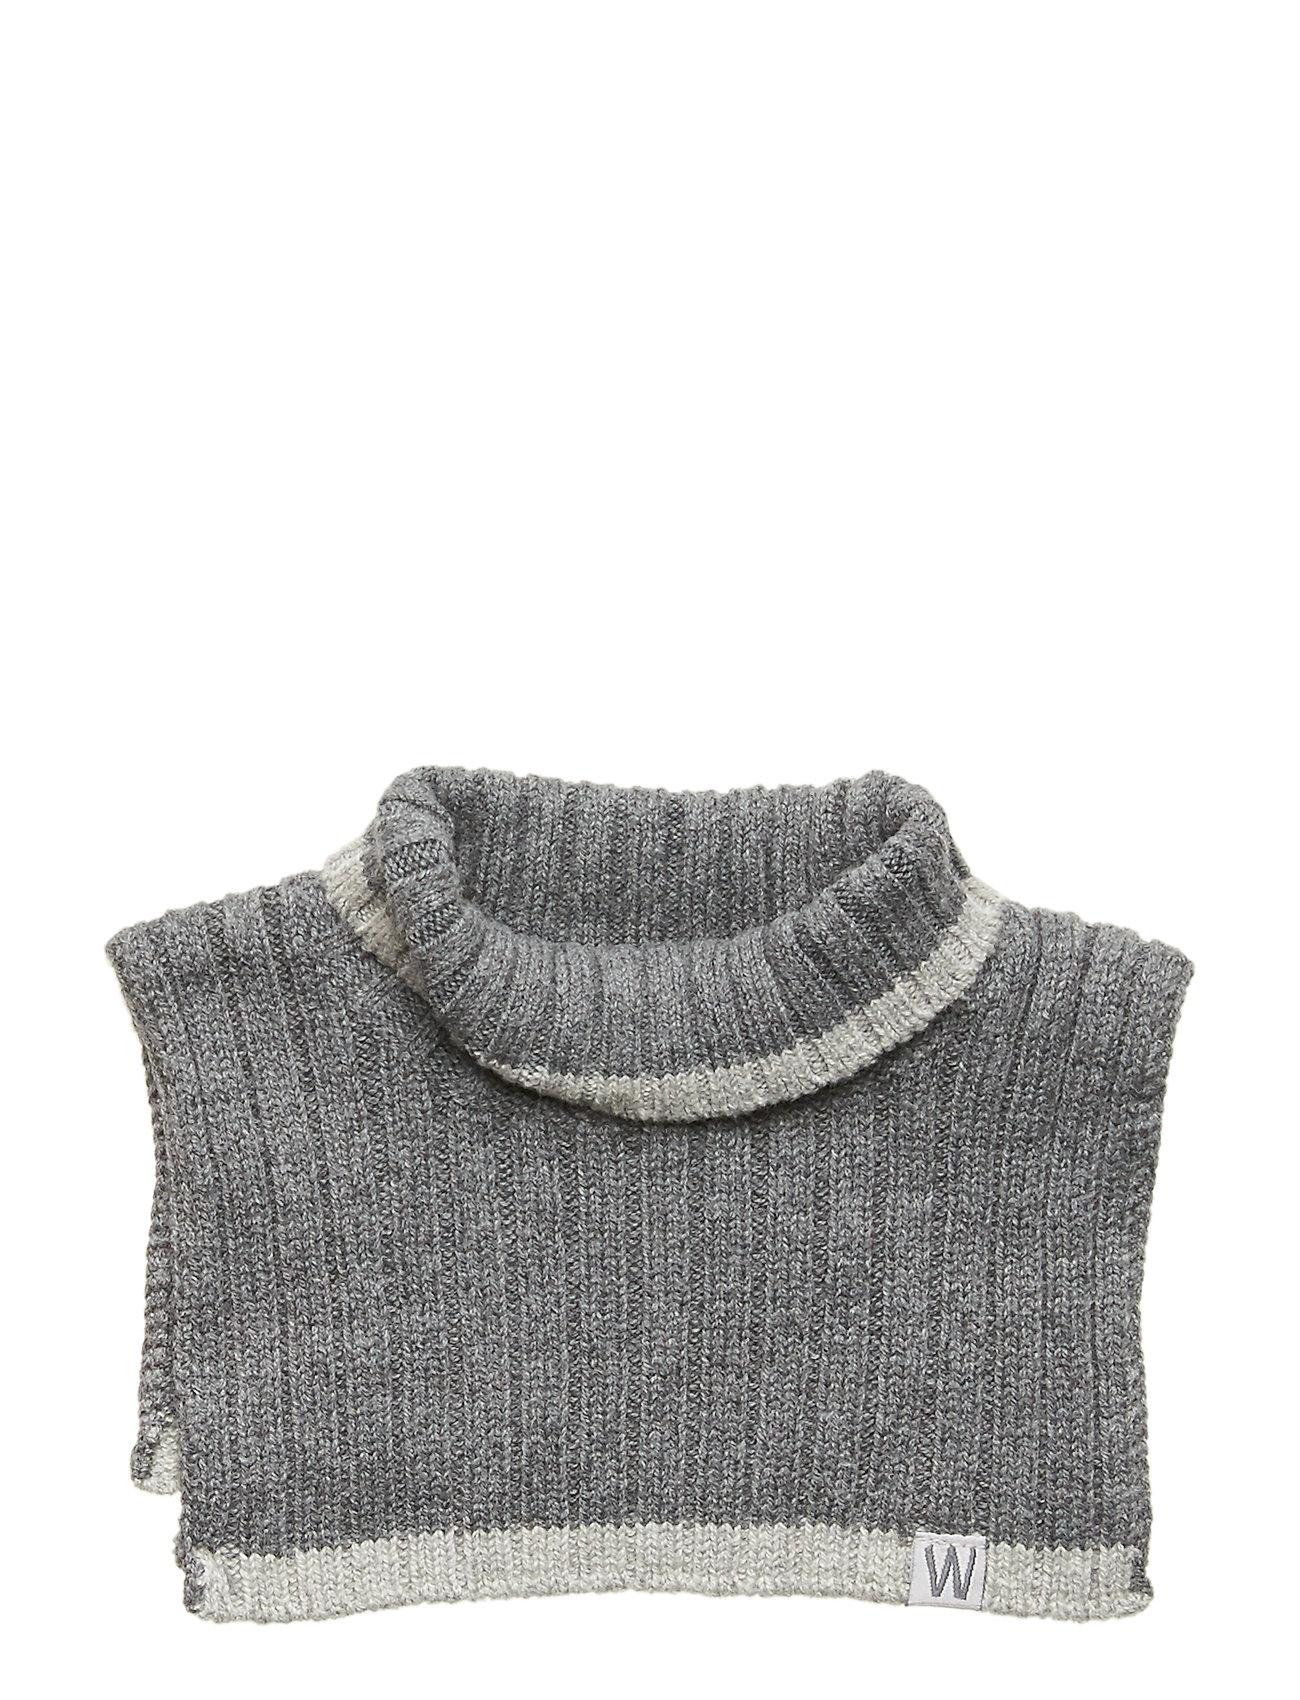 Image of Knitted Neck Warmer Tørklæde Grå Wheat (3406162827)